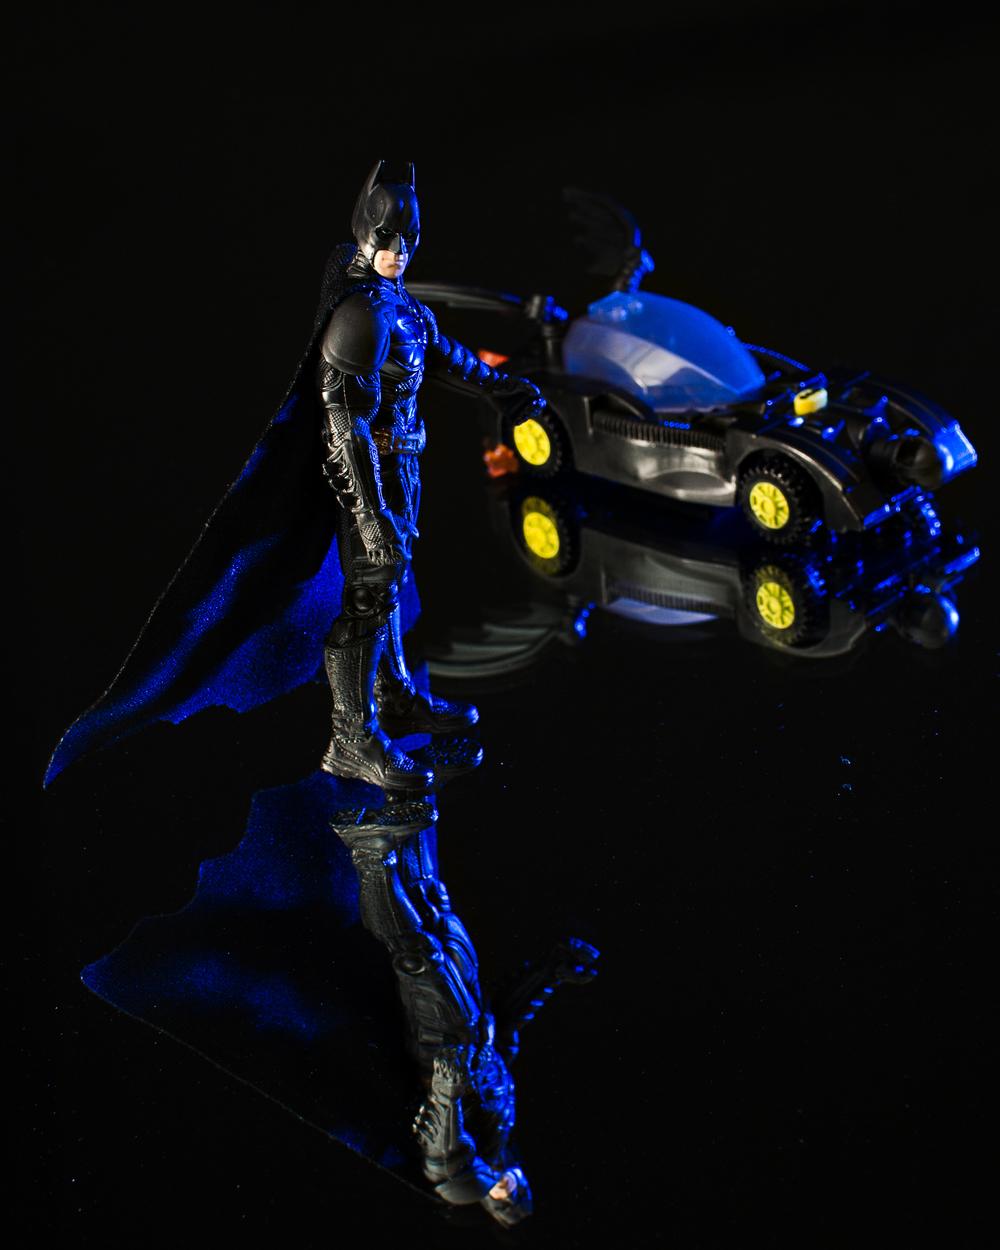 Toys365_2013-02-12_Batman_And_Car_-20-Edit.jpg